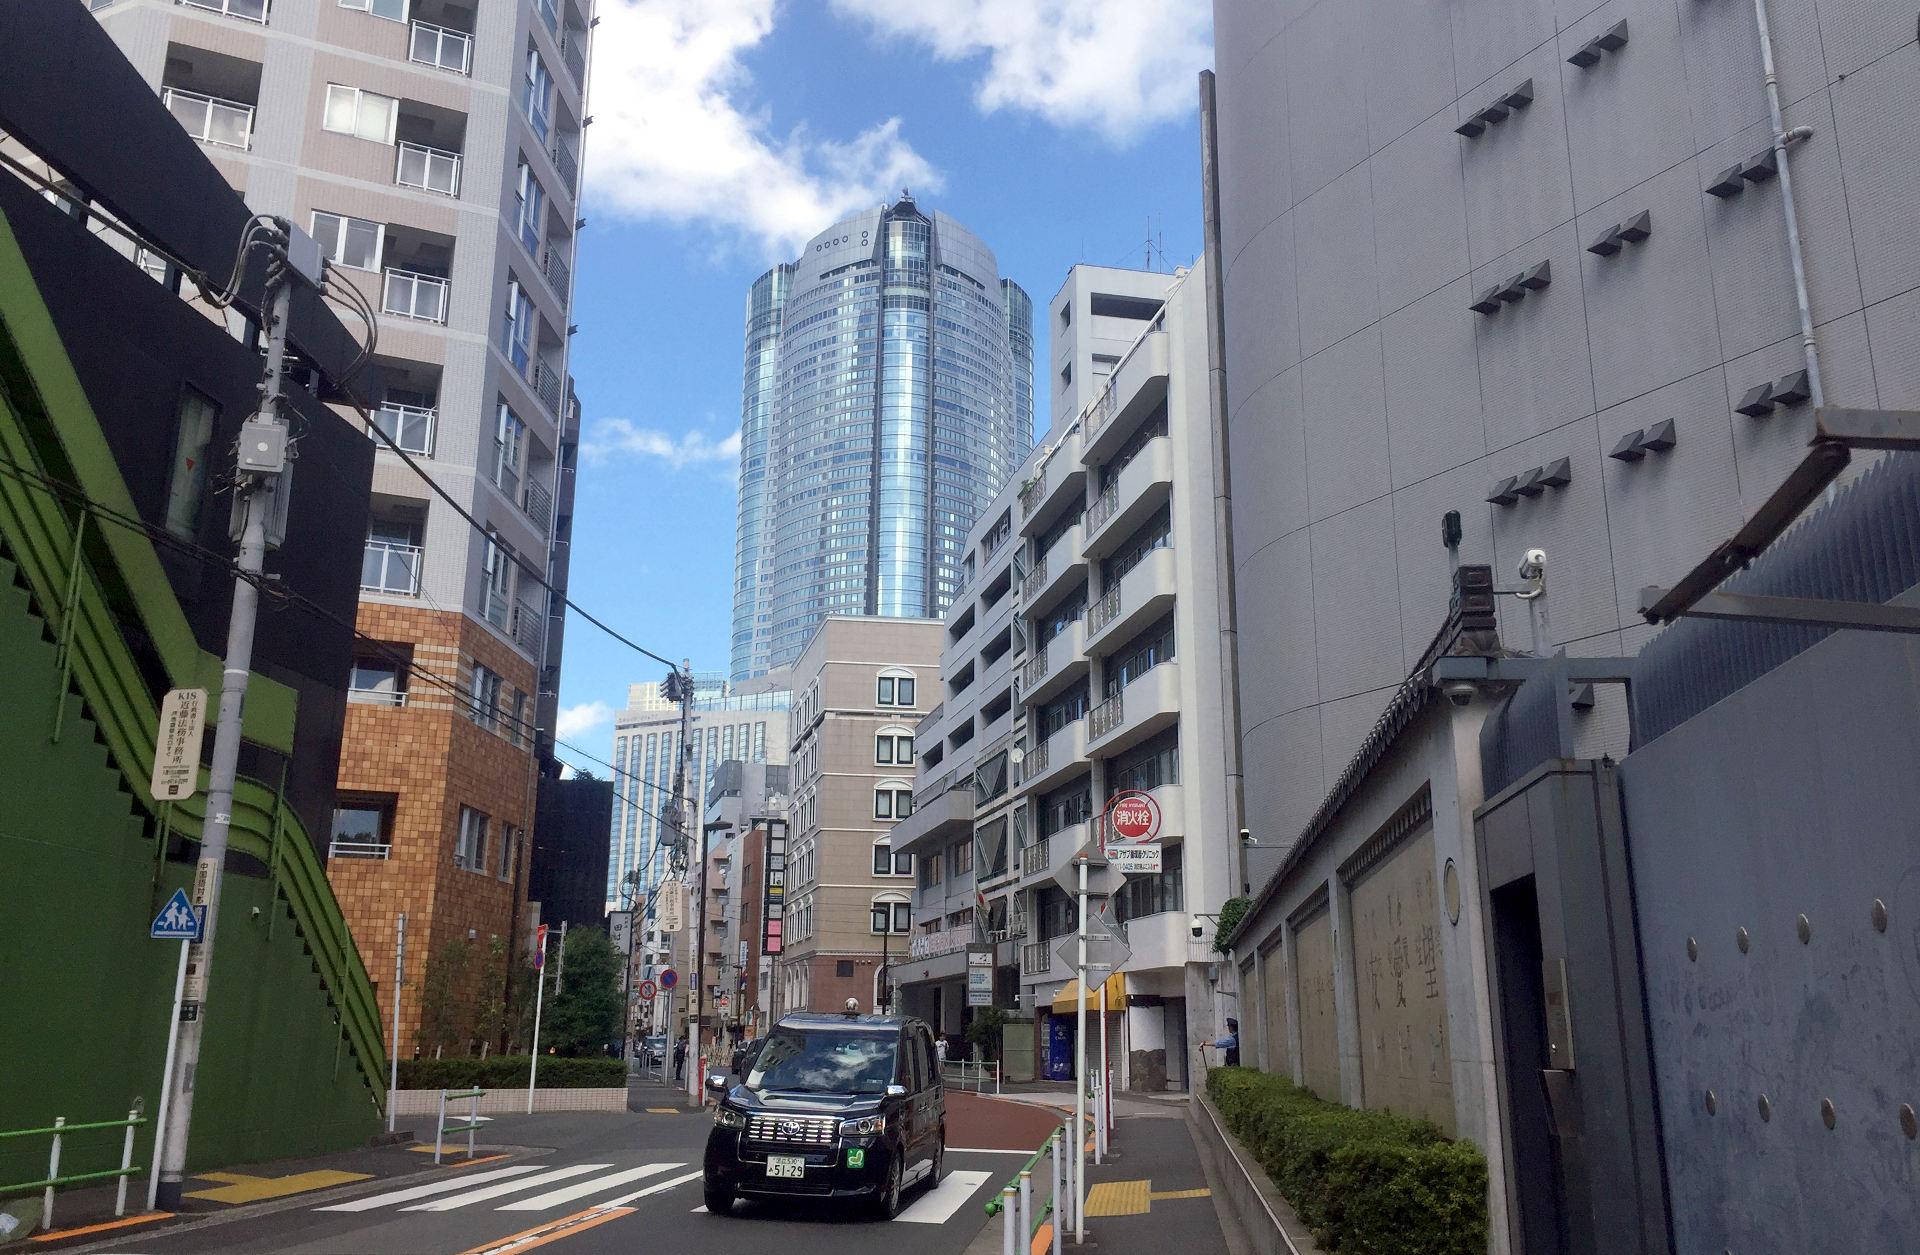 Rappongi Hills Miri Tower Minato Tokio iglawpodrozy